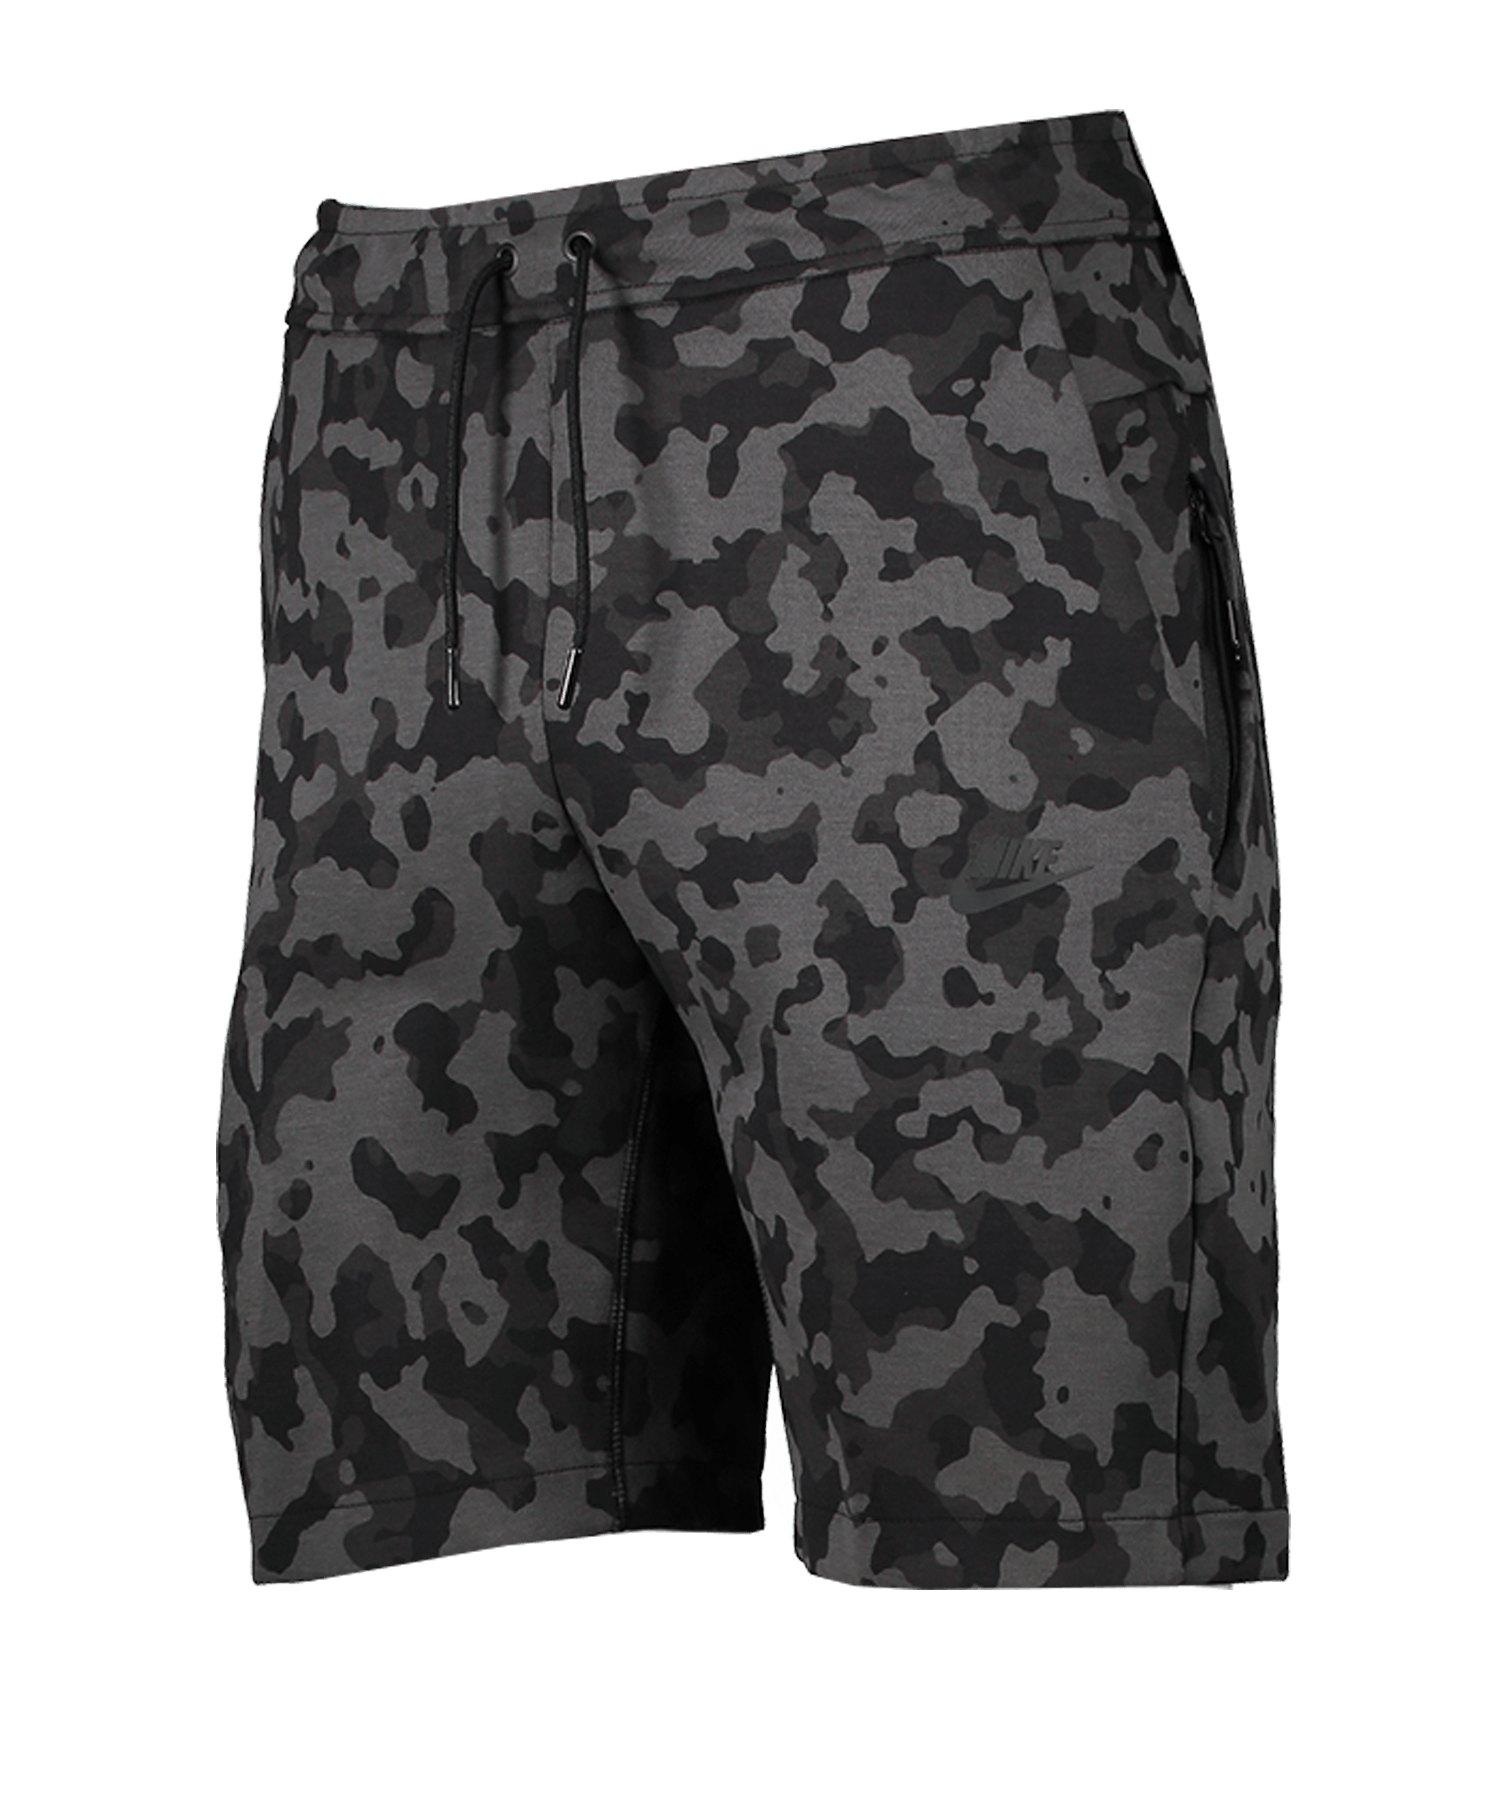 Nike AOP Tech Fleece Short Schwarz F010 - schwarz